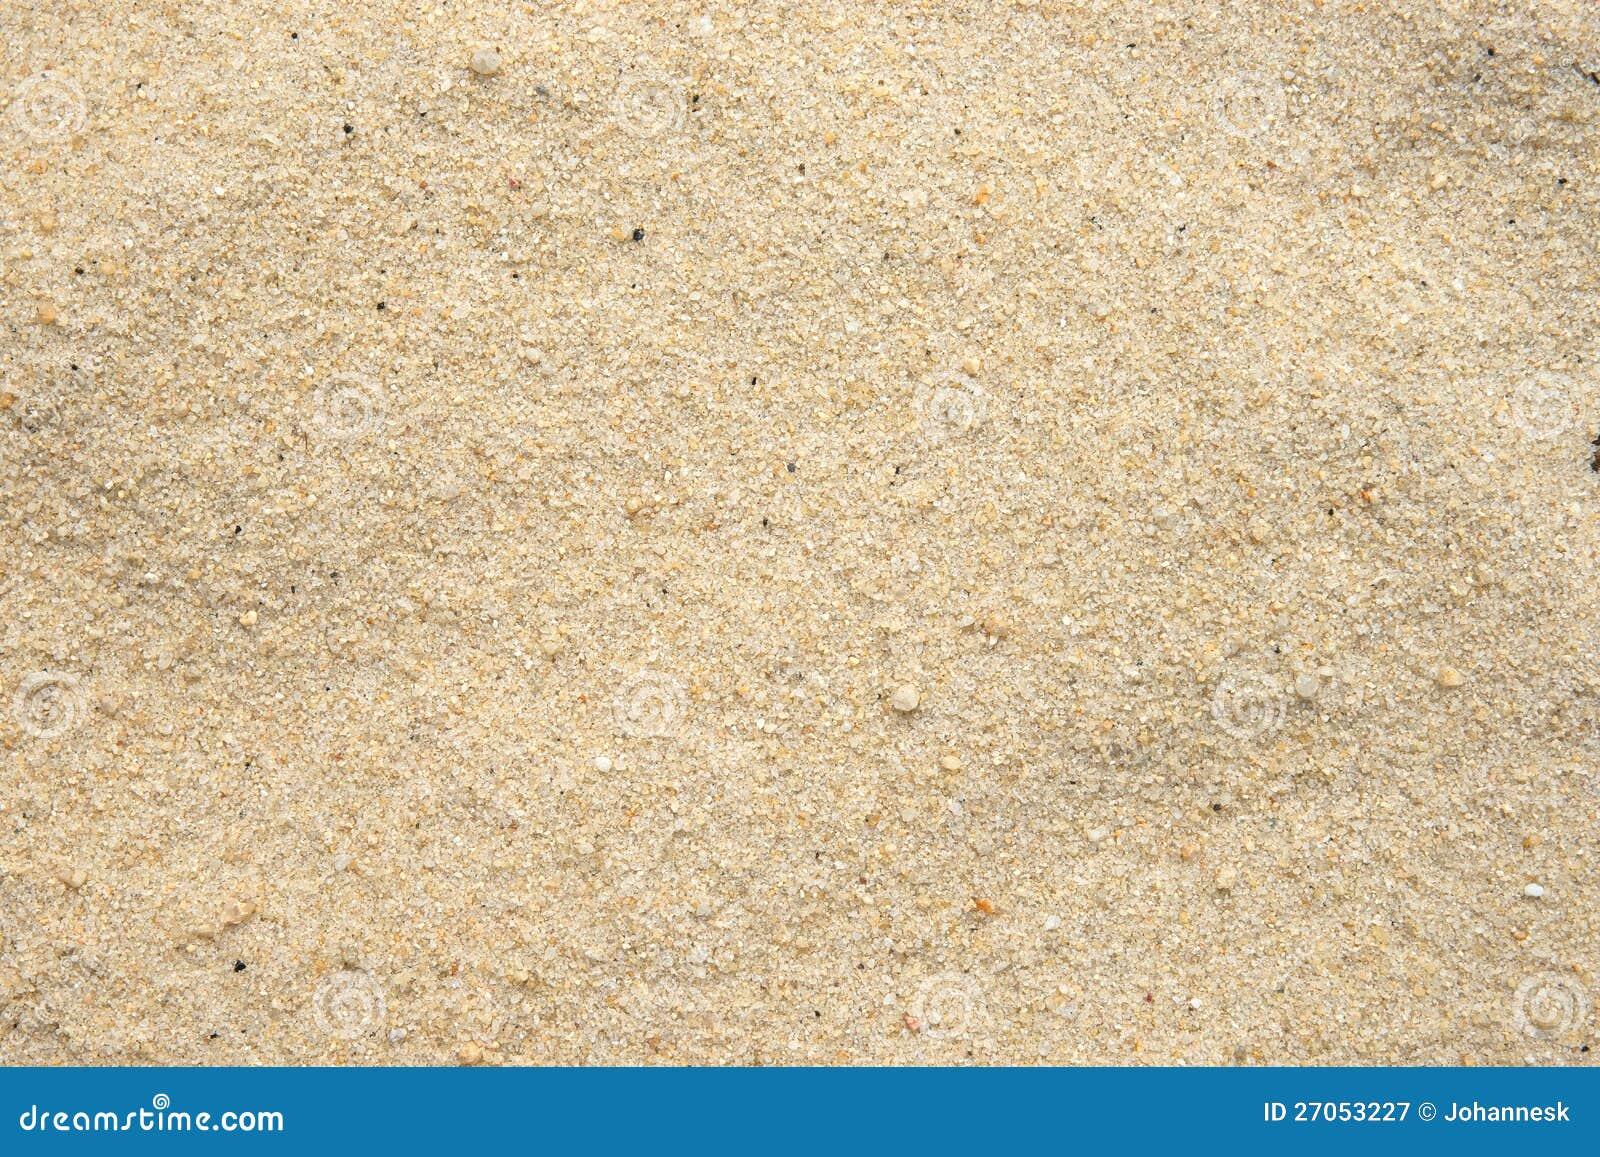 Beach Sand Grain Stock Image Of Grains Background